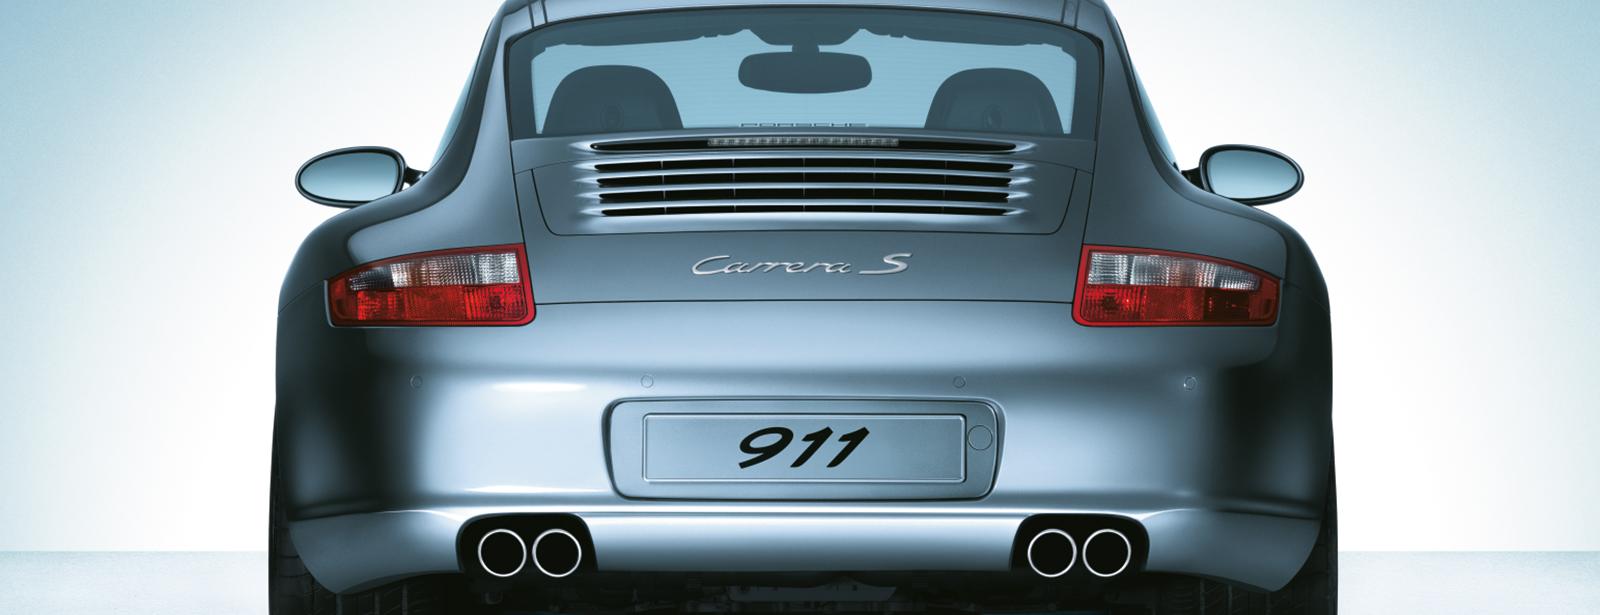 Sportabgasanlage 911 Carrera 997